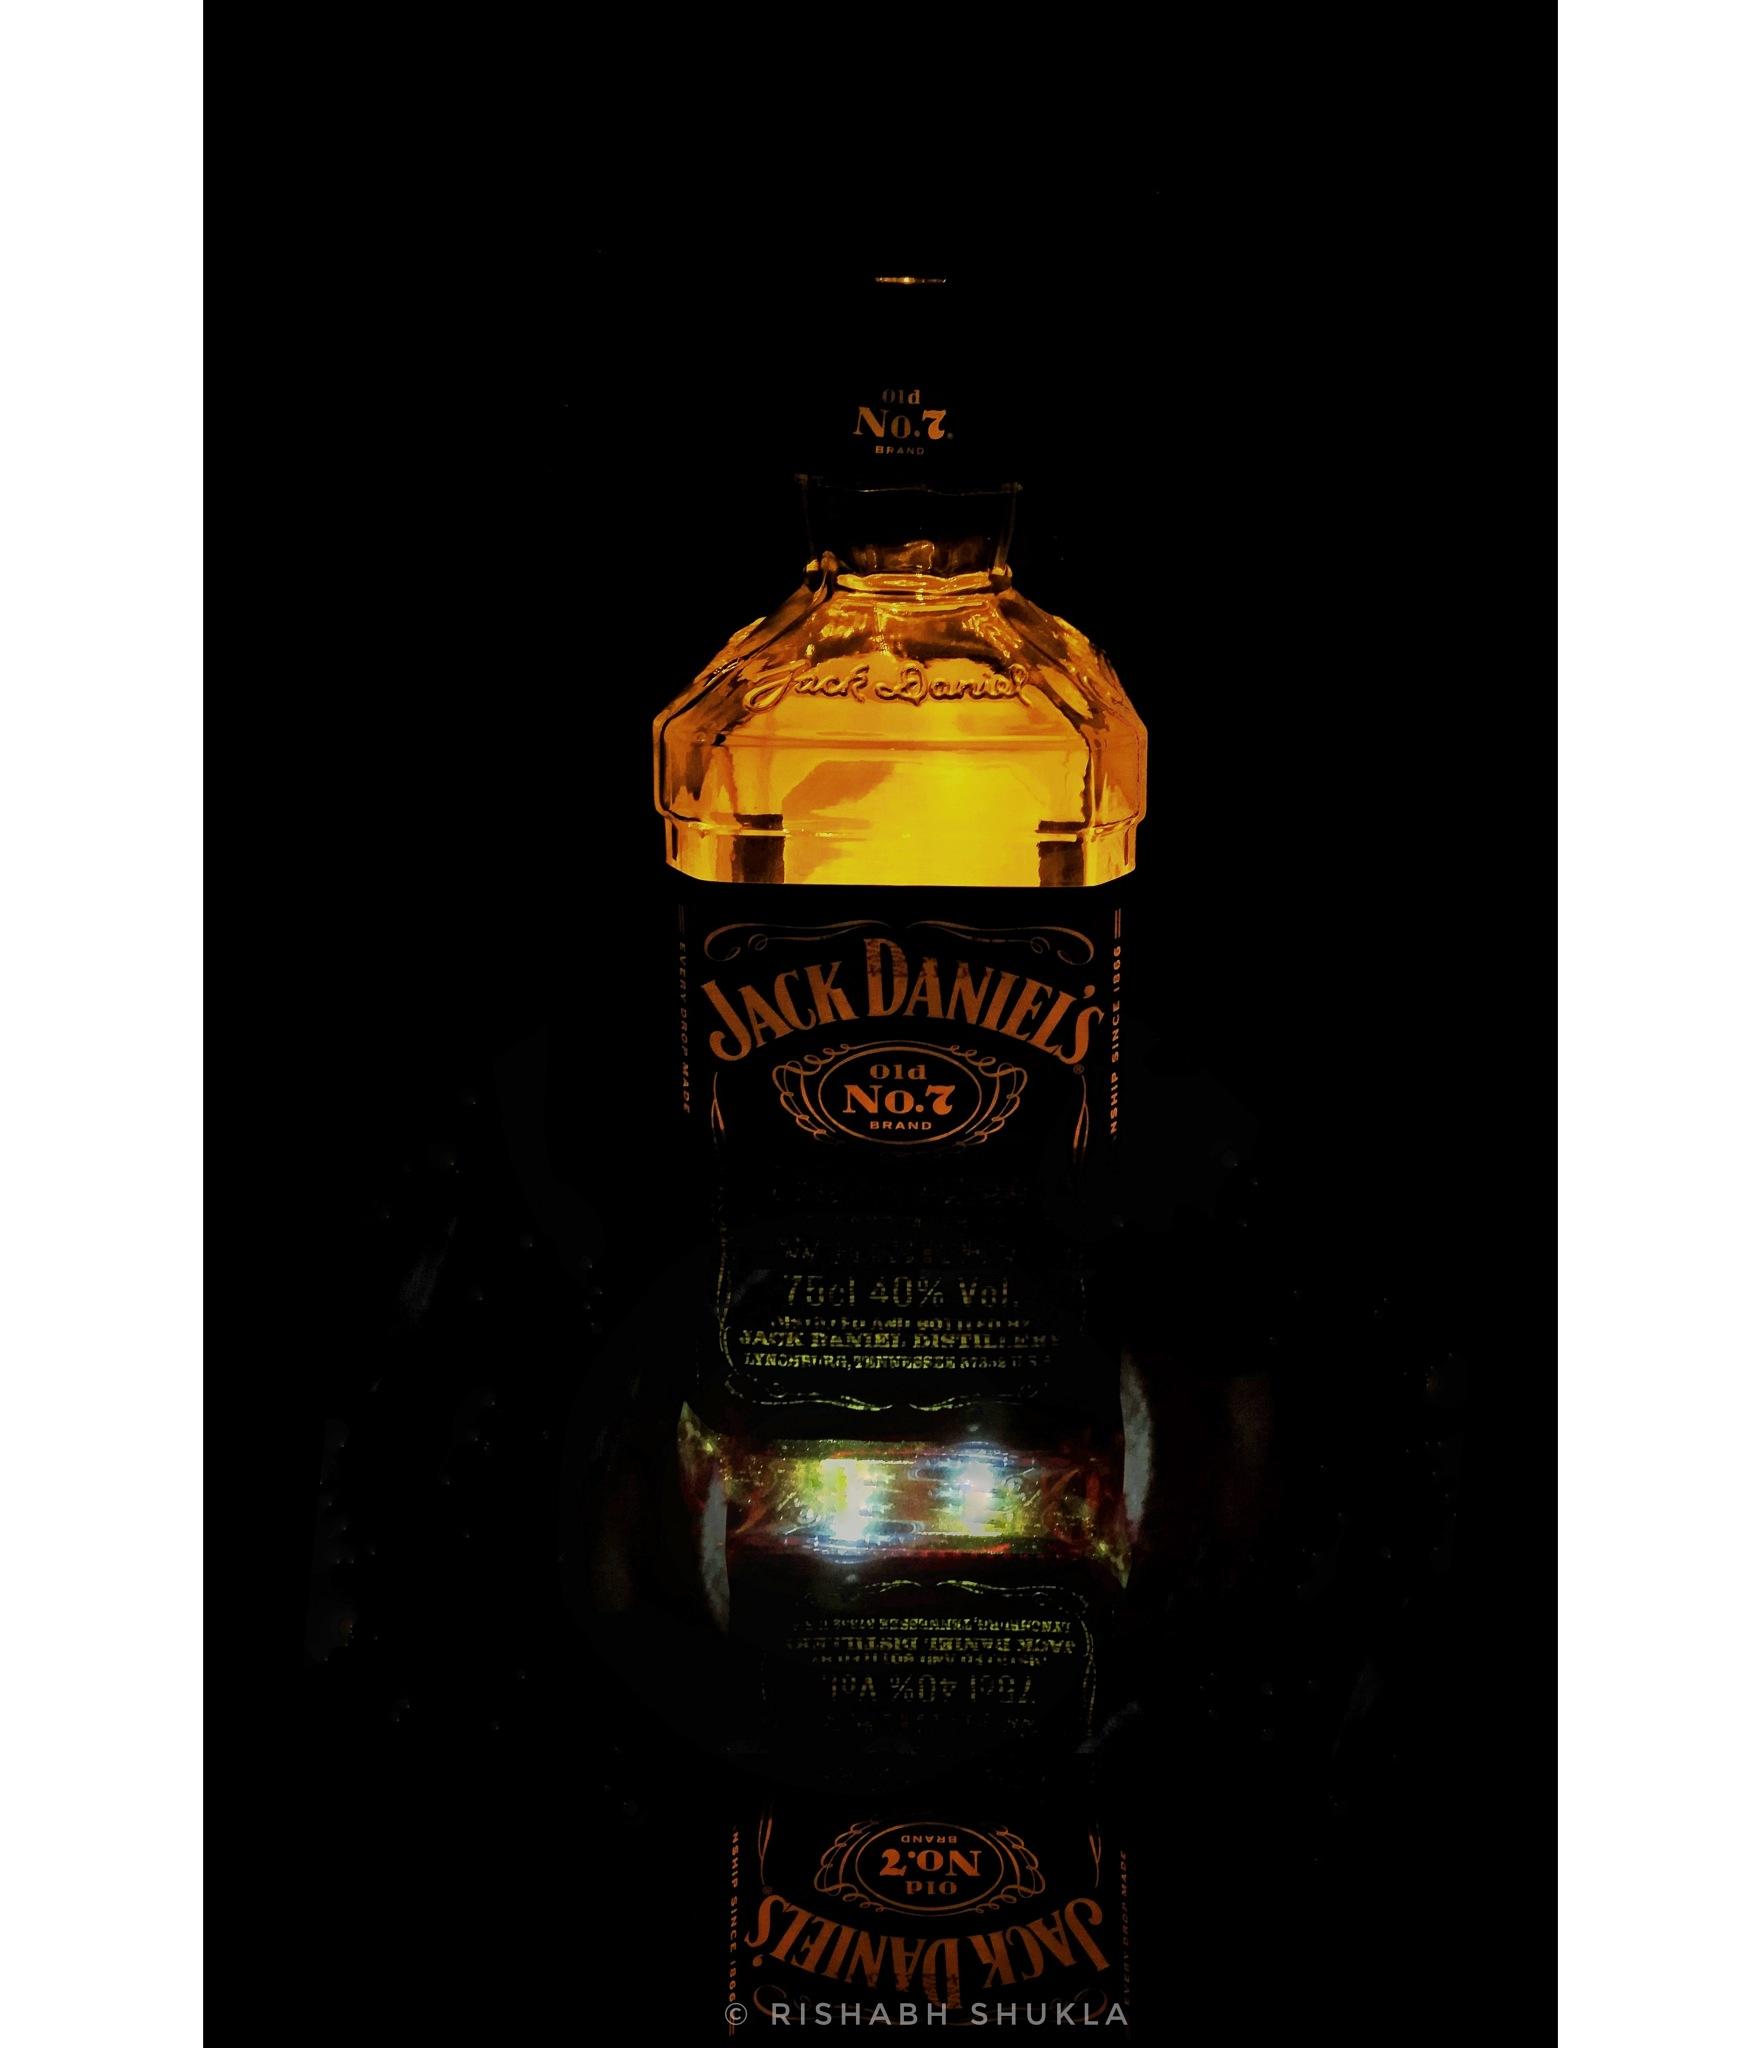 Jack Daniels by Rishabh Shukla